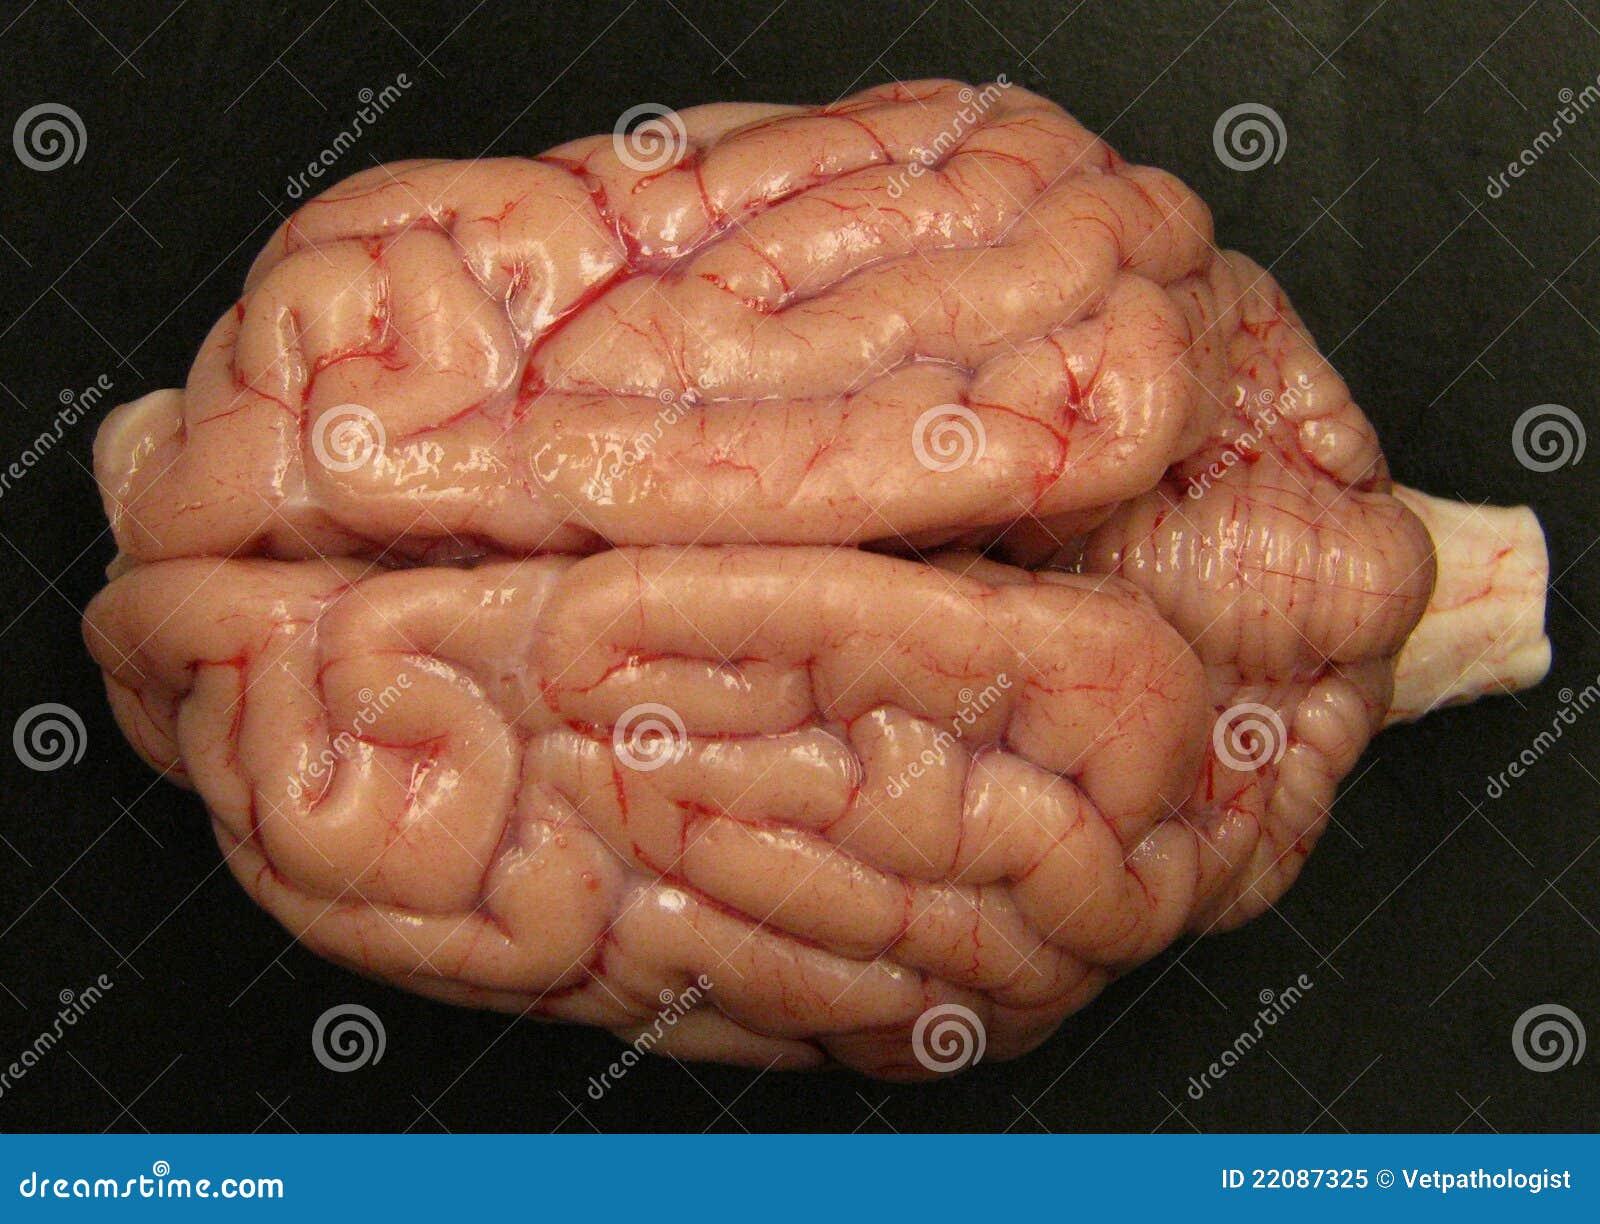 Dog Brain Anatomy - Anatomy Of A Male Dog Brain Stock Illustration ...